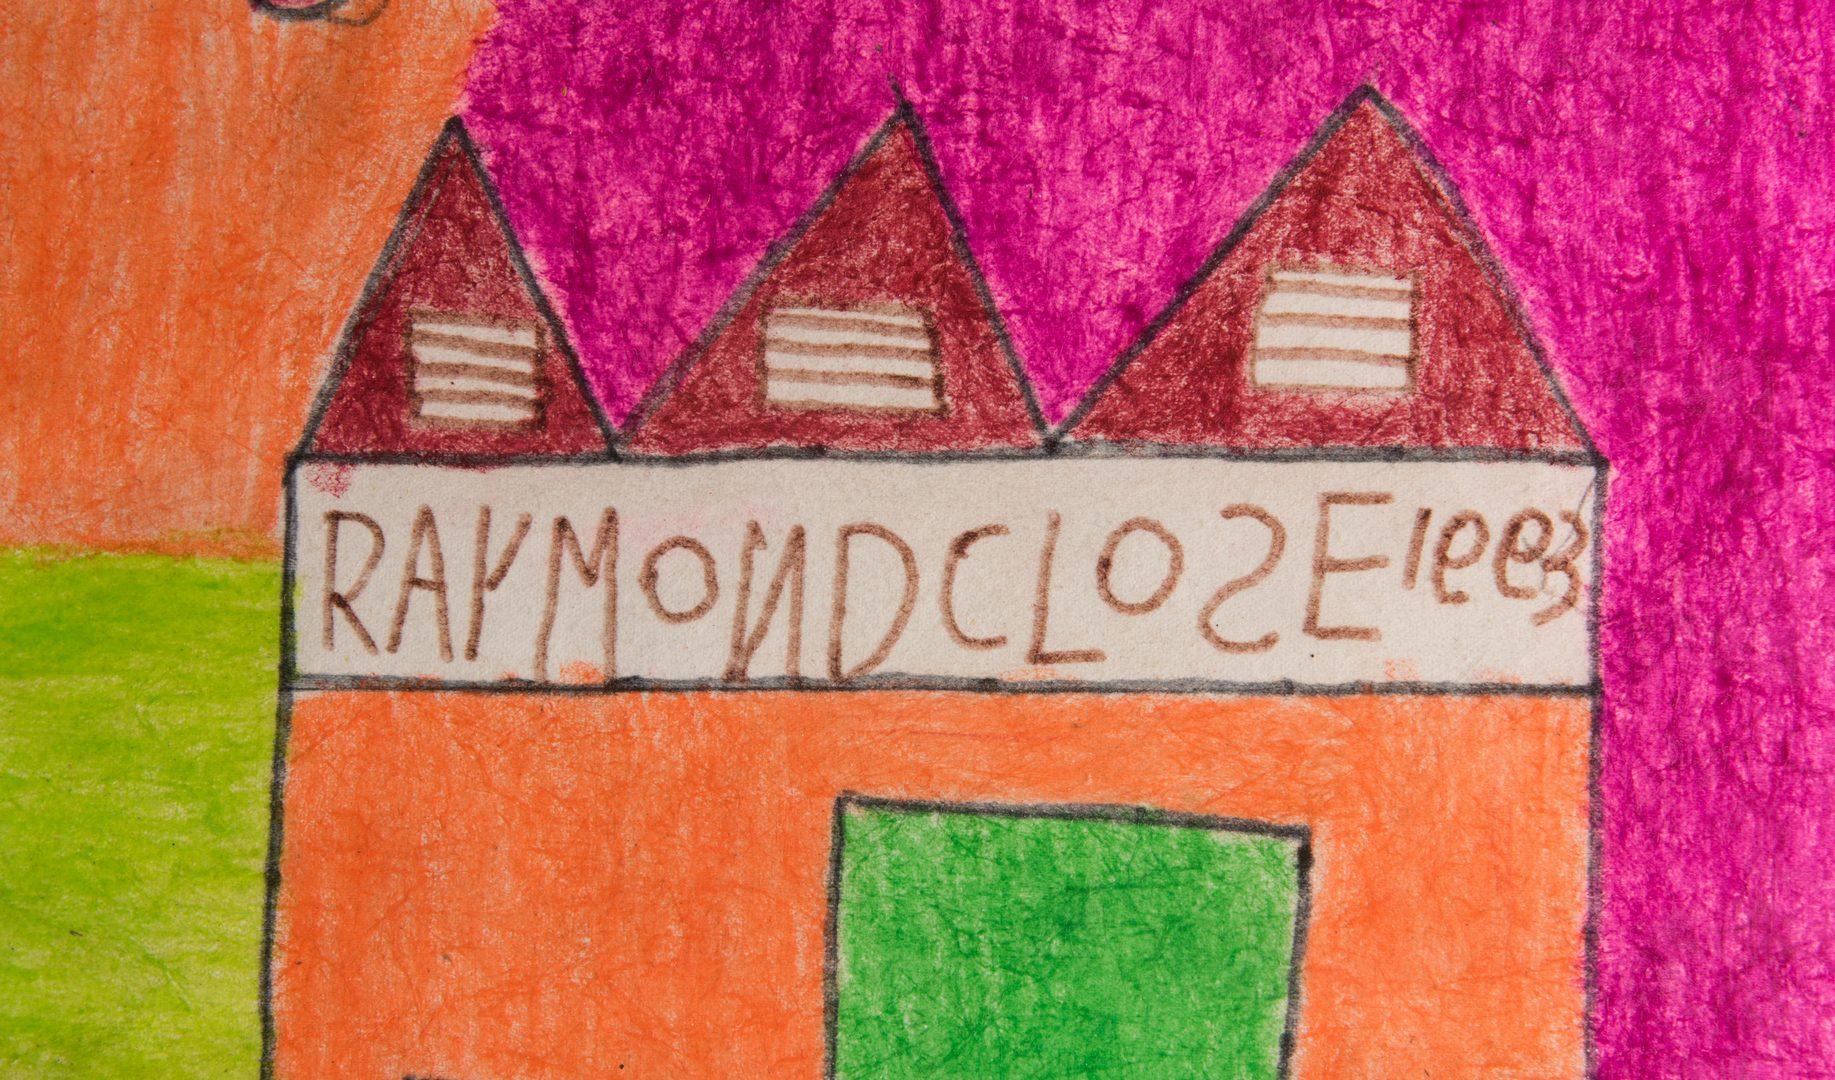 Lot 234: 2 Raymond Close Folk Art Items